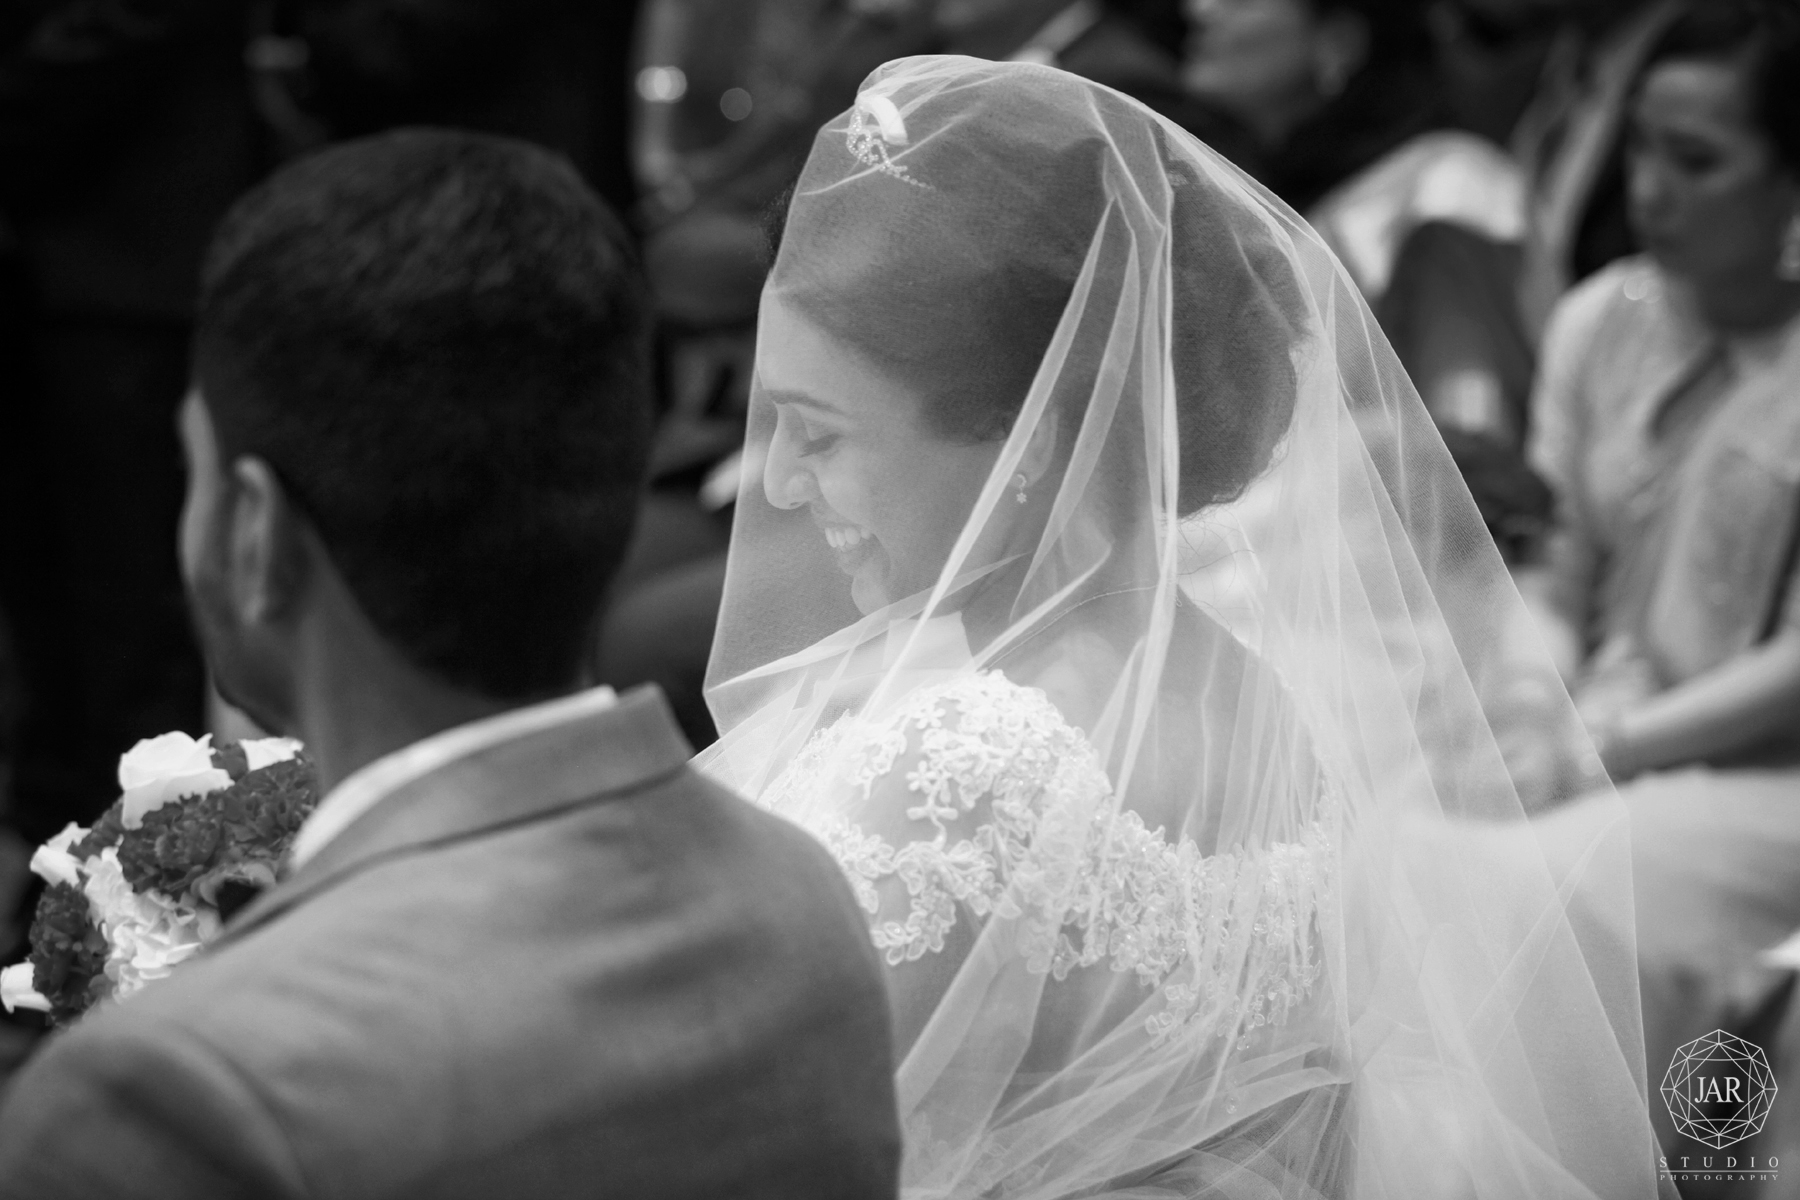 20-fun-at-the-ceremony-melbourne-fl-wedding-photographer-jarstudio.jpg